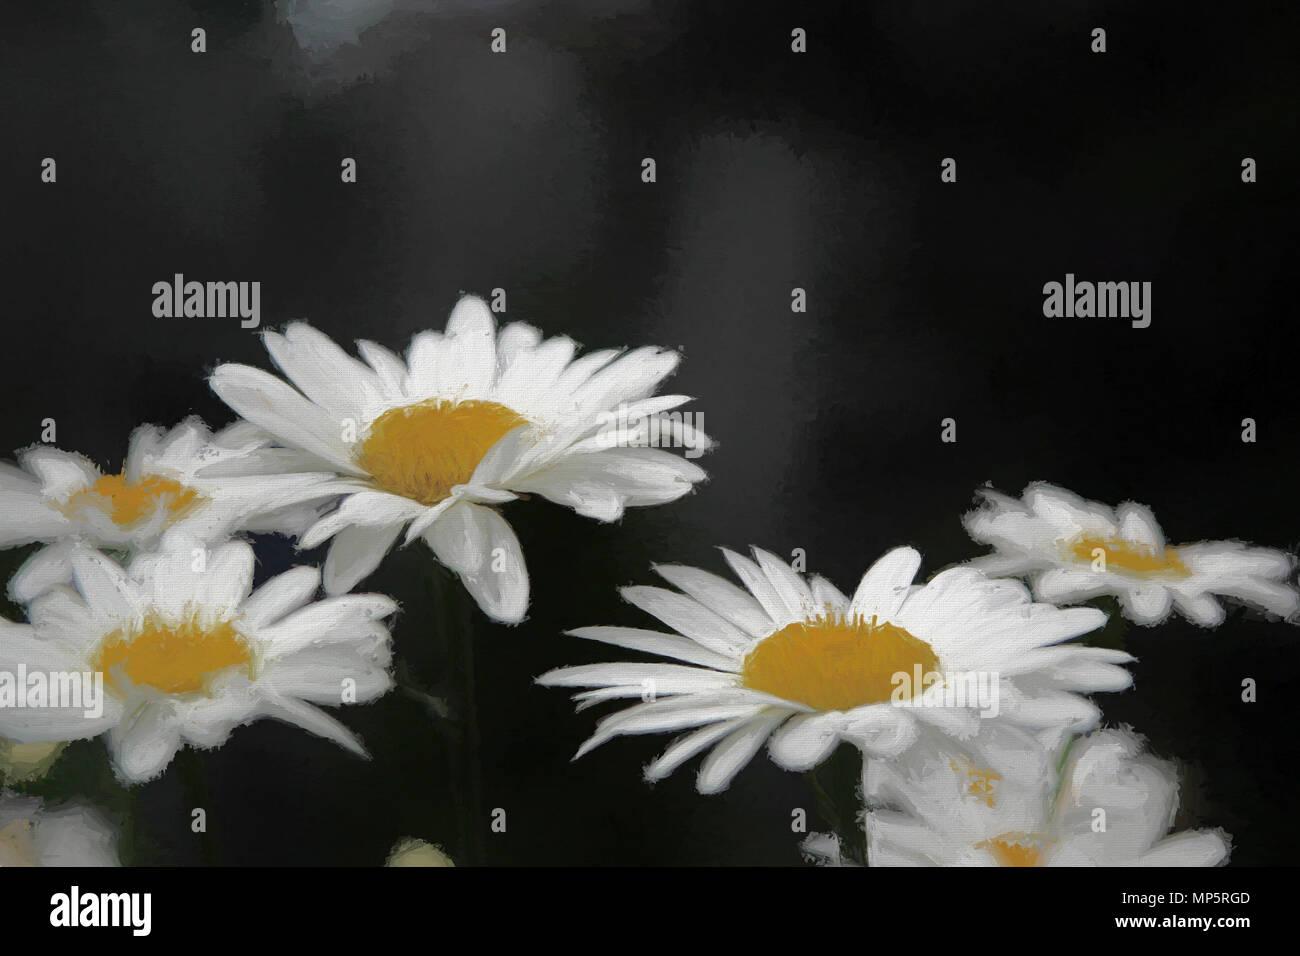 Soft Daisies on Black - Stock Image